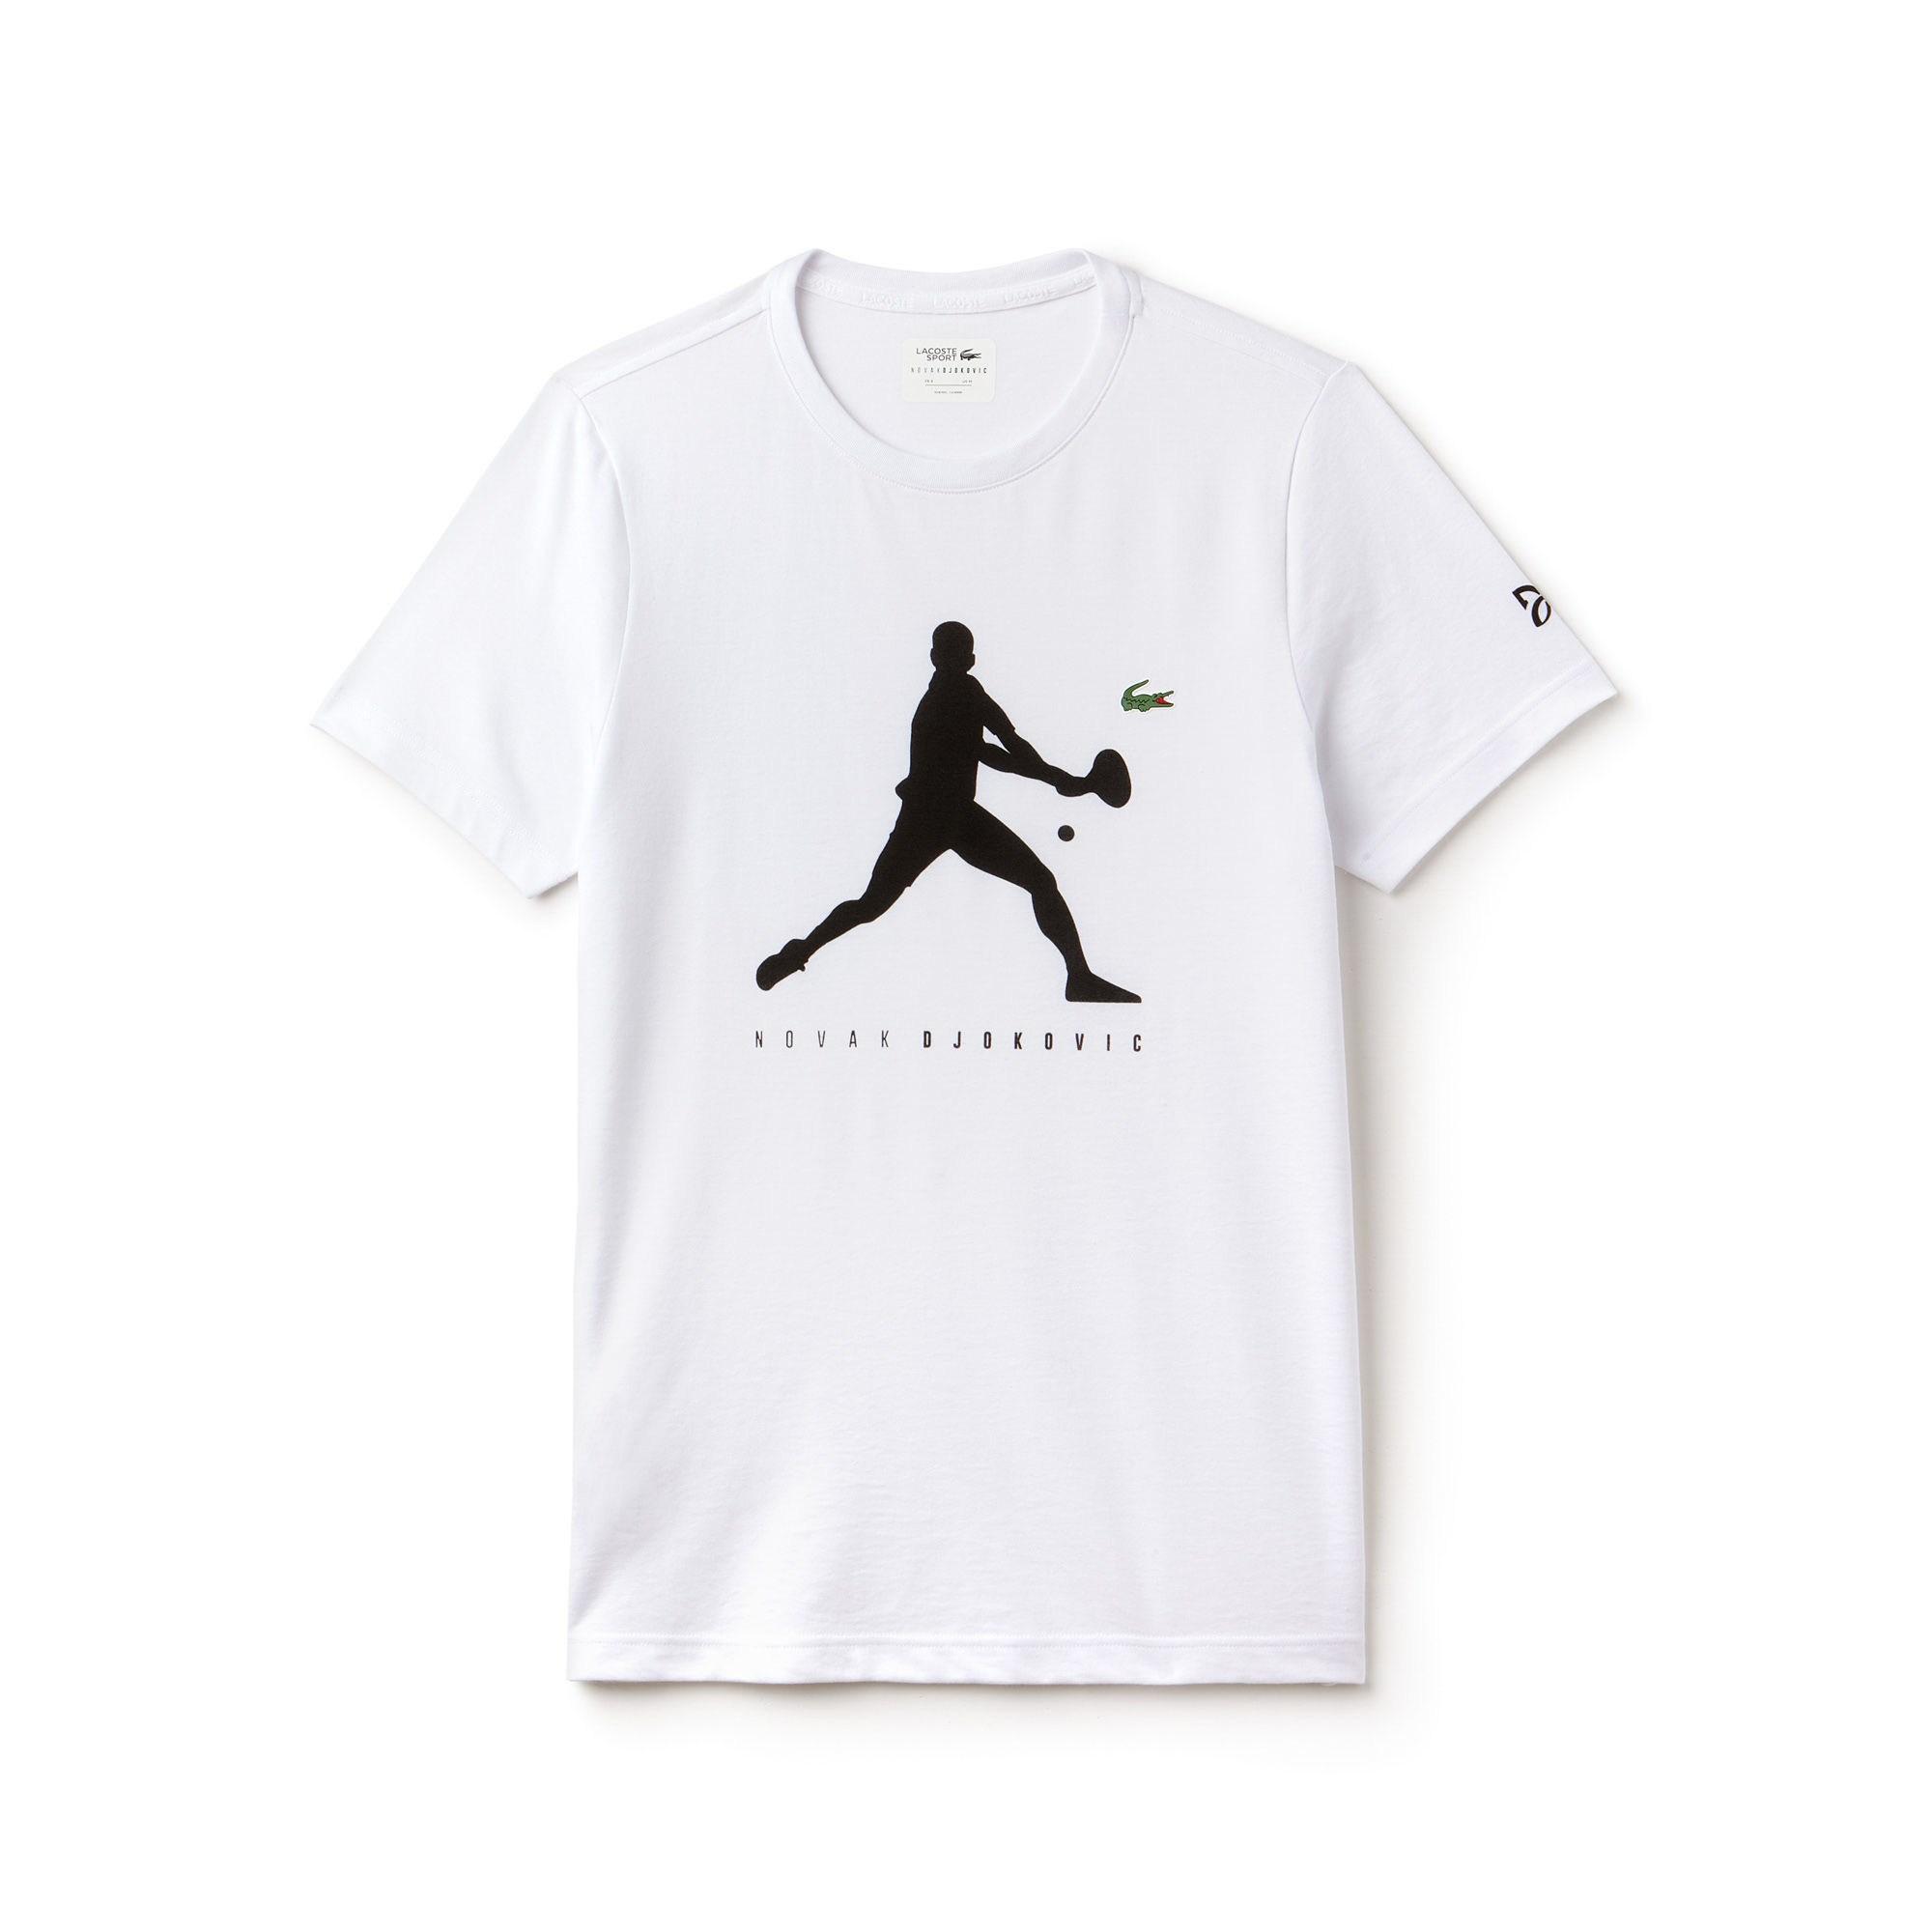 Novak Djokovic Tee Shirts 51 Off Tajpalace Net